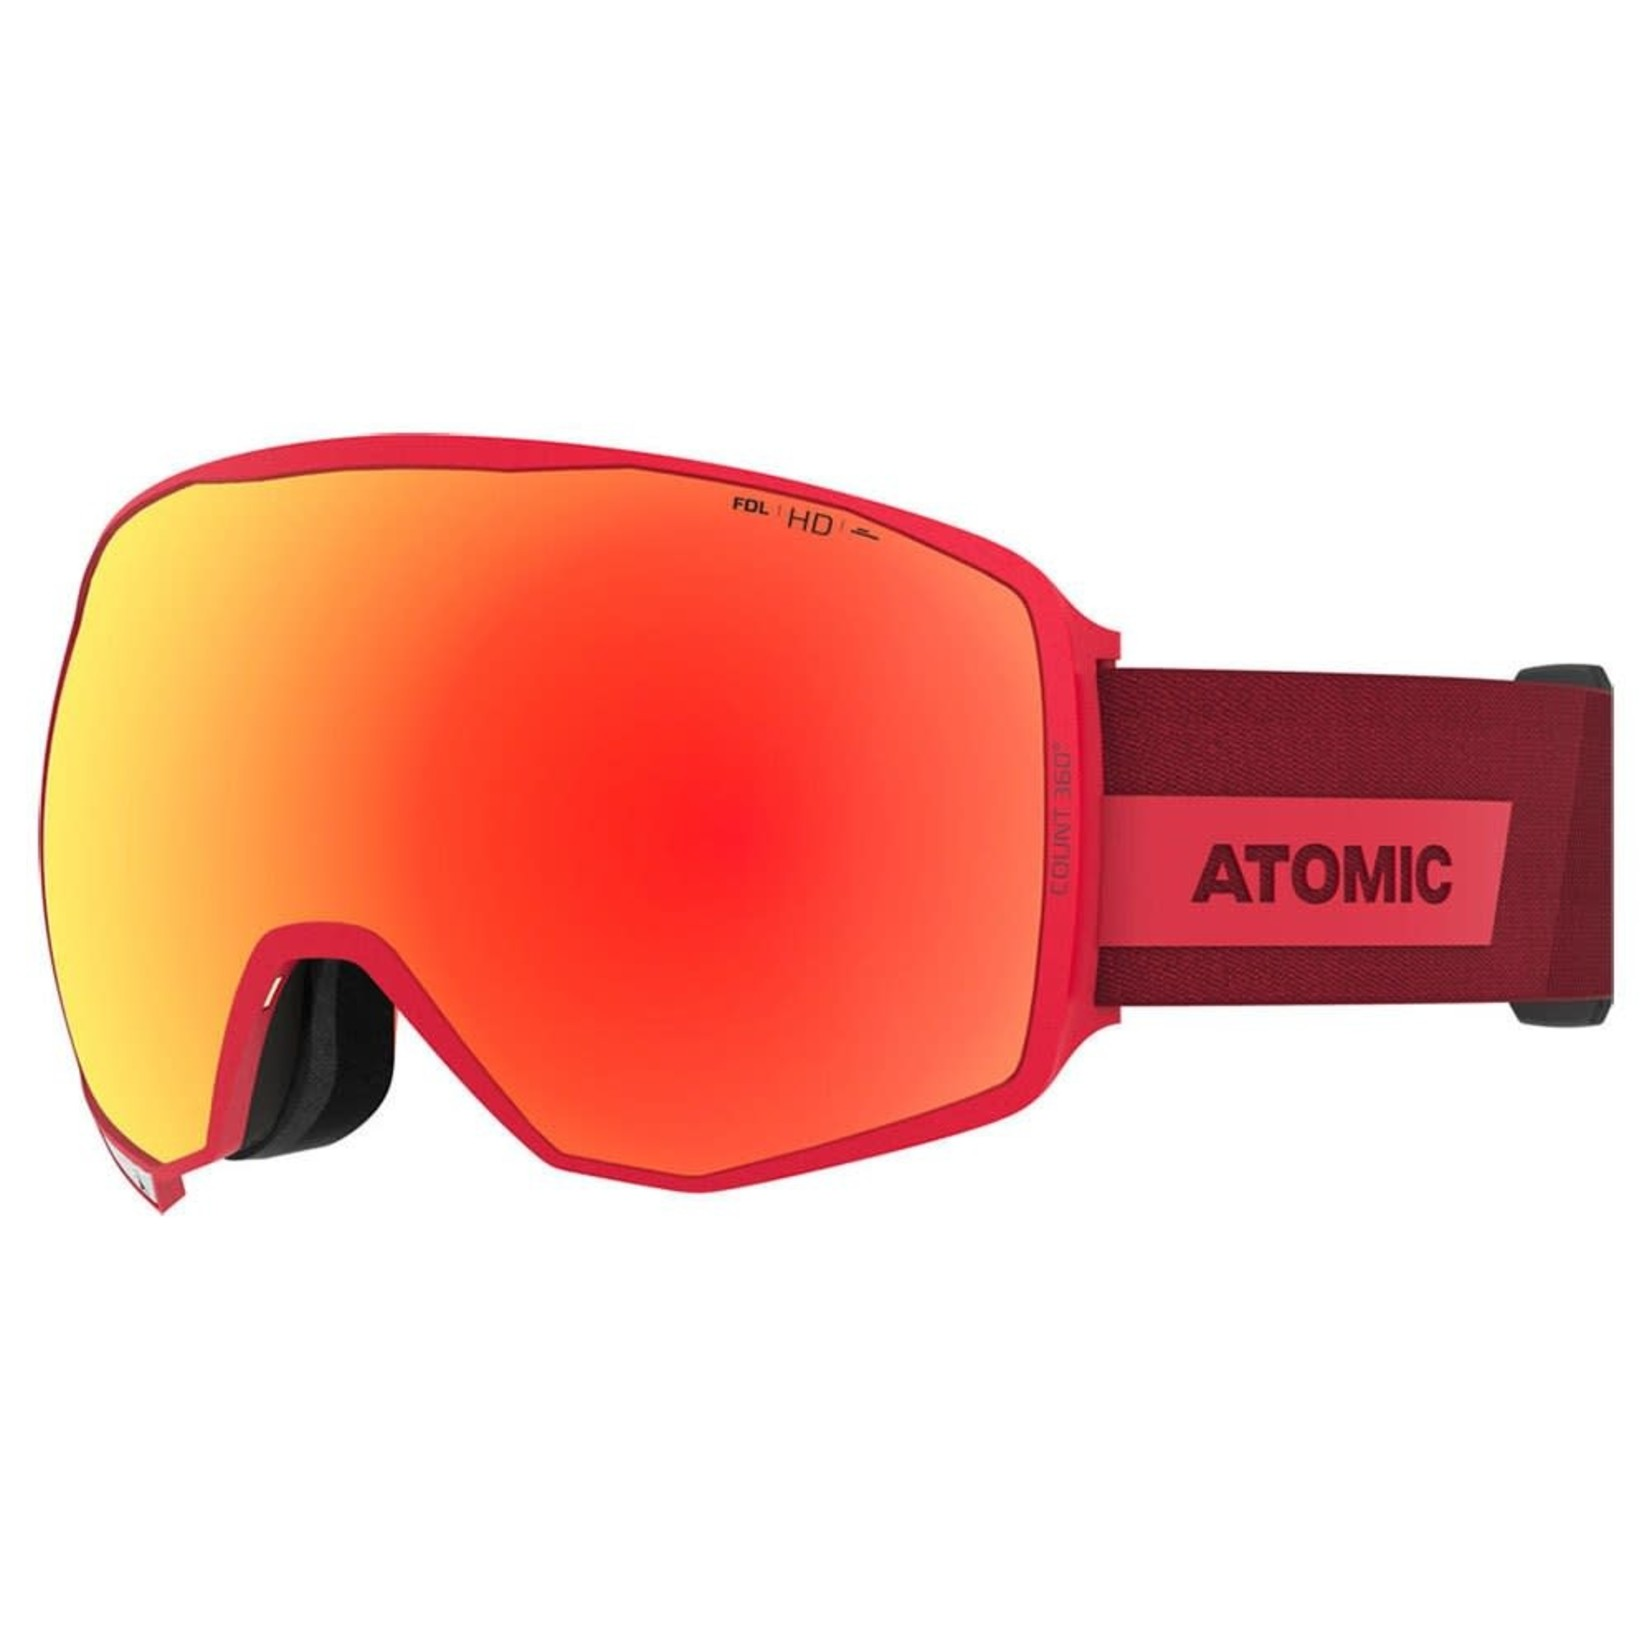 Atomic Lunette de ski Atomic Count 360 HD - Unisexe